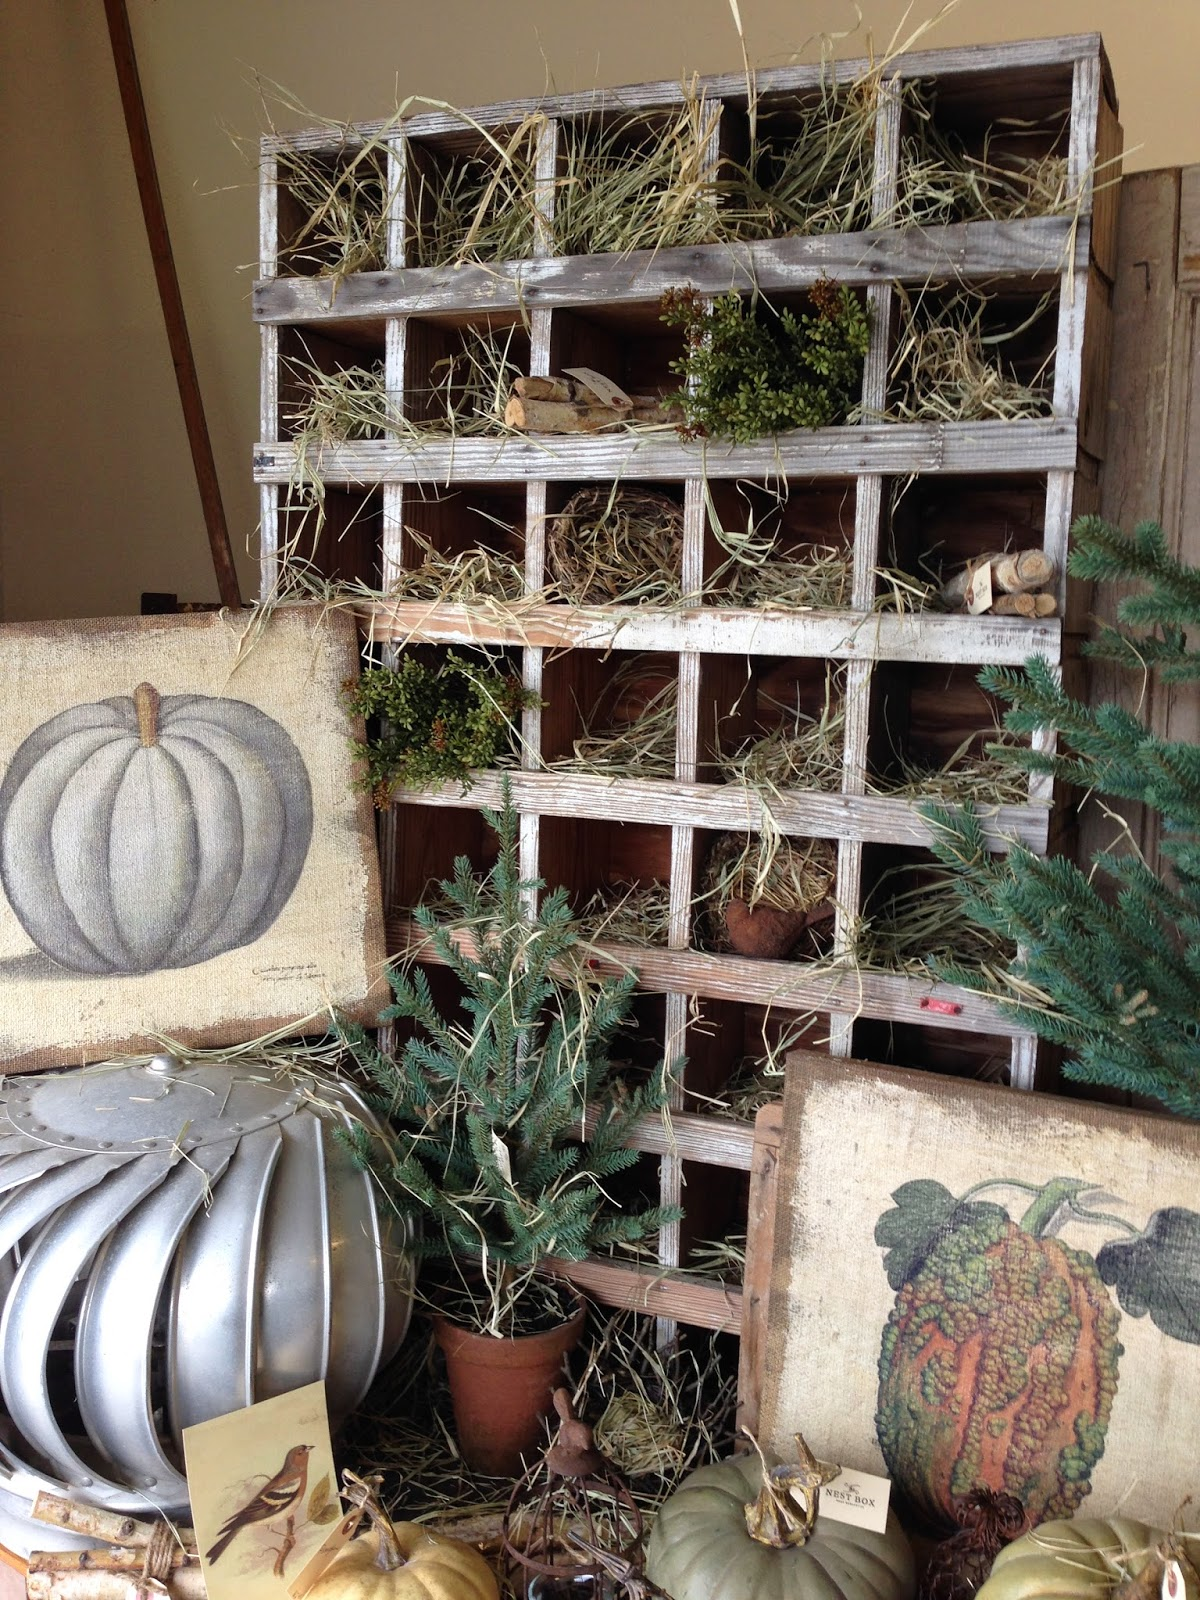 The Nest Box Home Mercantile Taylor TX